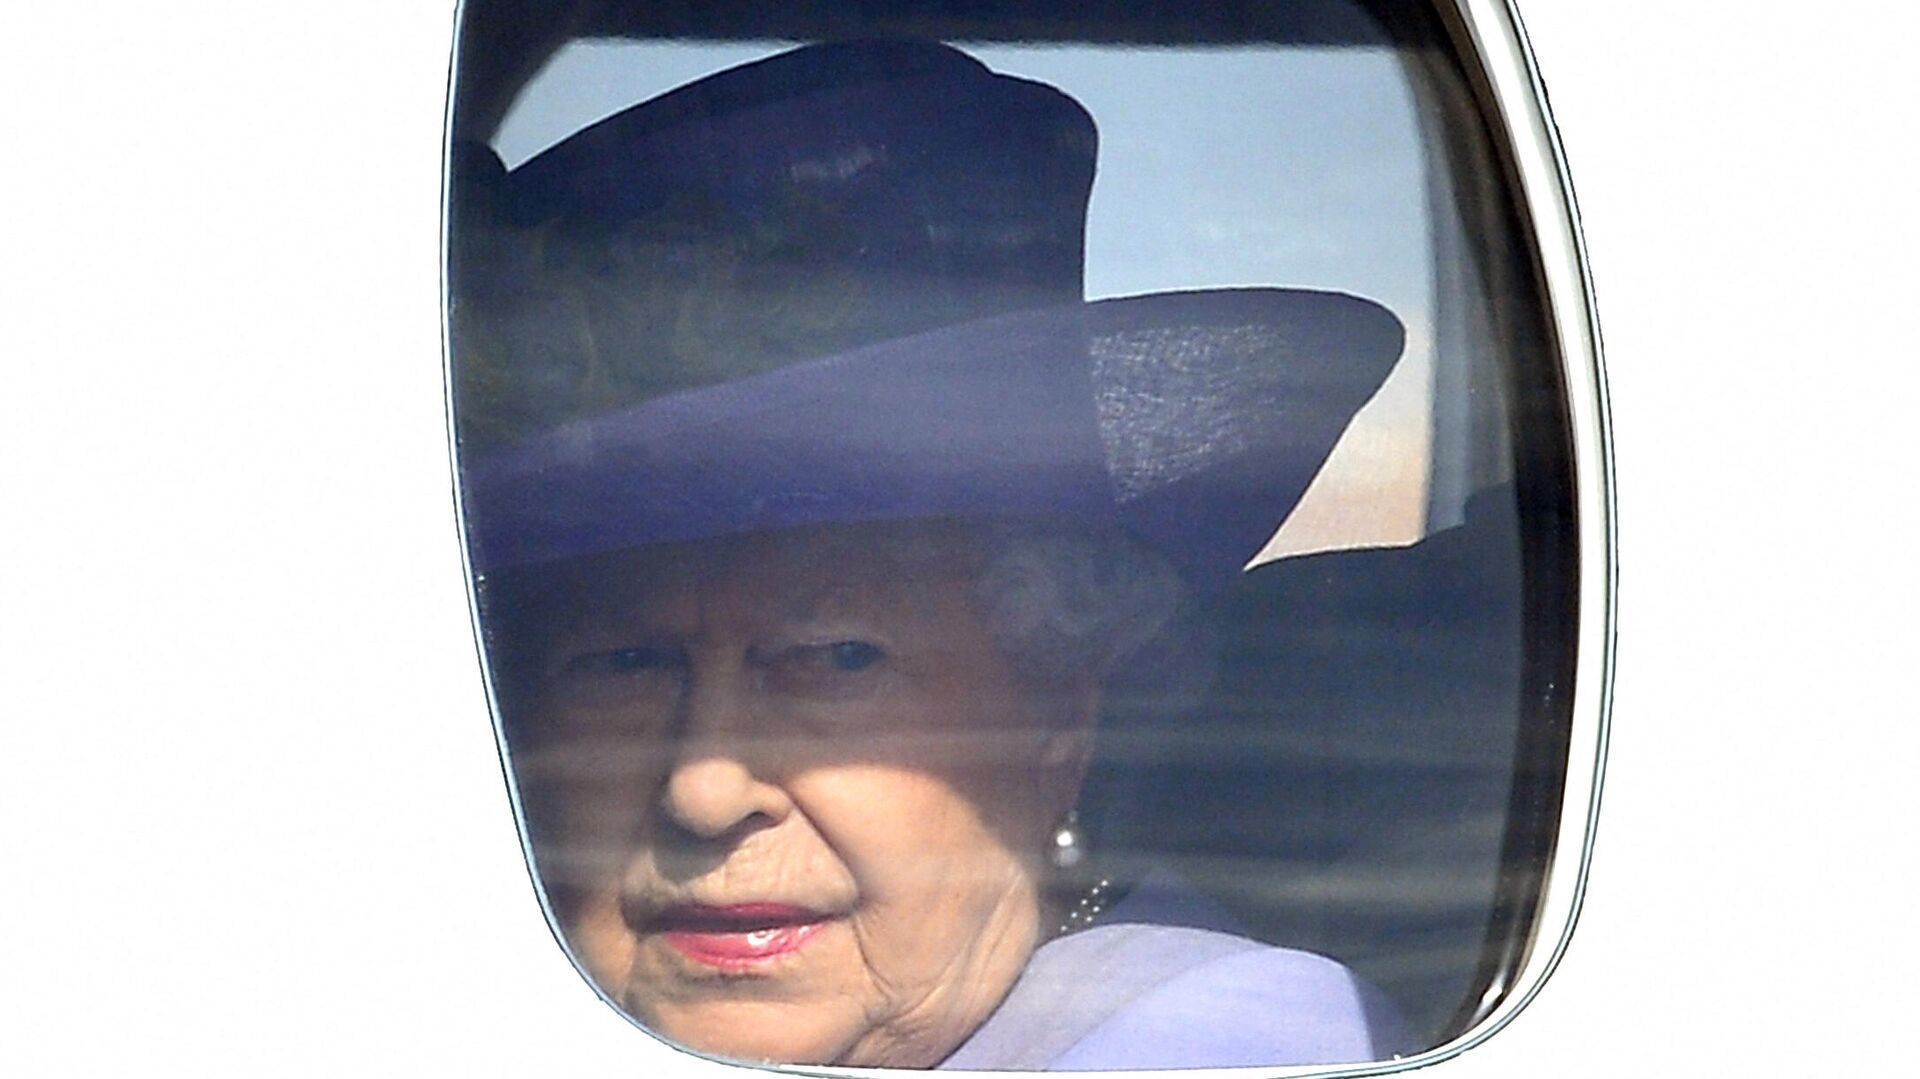 La reina Isabel II en un avión - Sputnik Mundo, 1920, 12.04.2021